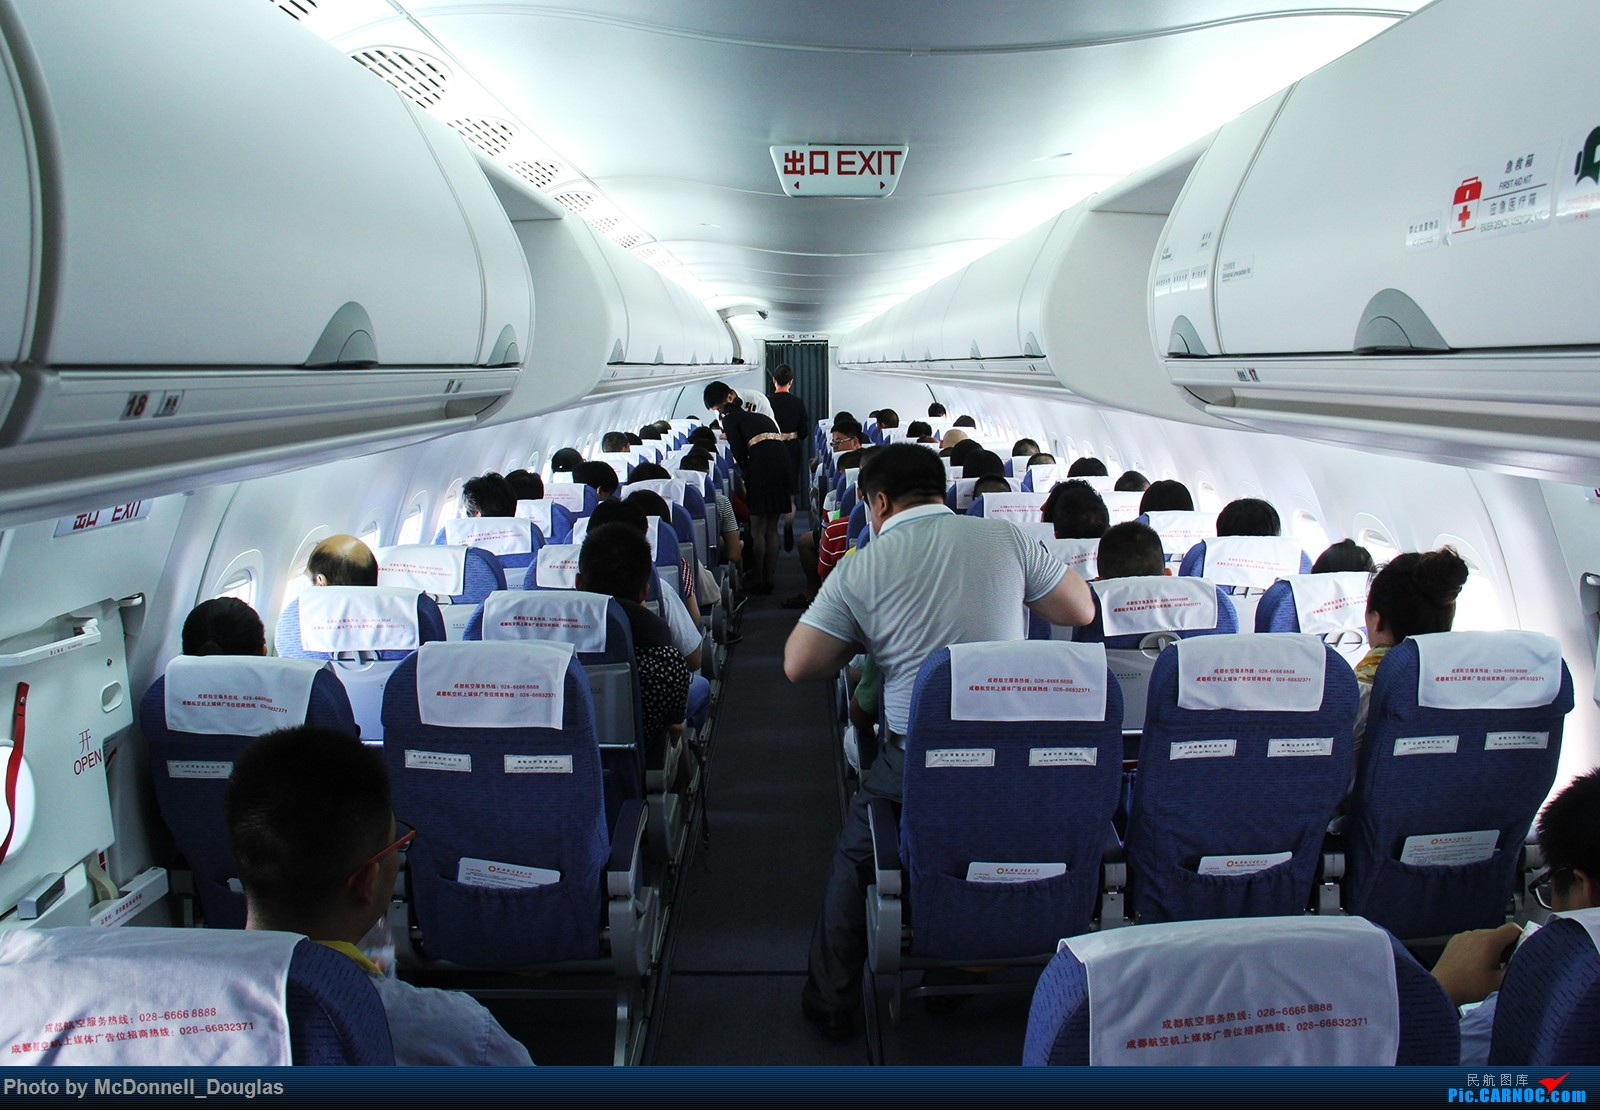 Re:[原创]【上海飞友会】【zc带你走天下(3)】再访祖辈年轻时工作的土地,父母年少时生活戈壁,跨越大半个中国去看新疆,回程小游蓉城(下)【已更至ARJ21详尽评测 COMAC ARJ21-700 B-3321 中国成都双流国际机场